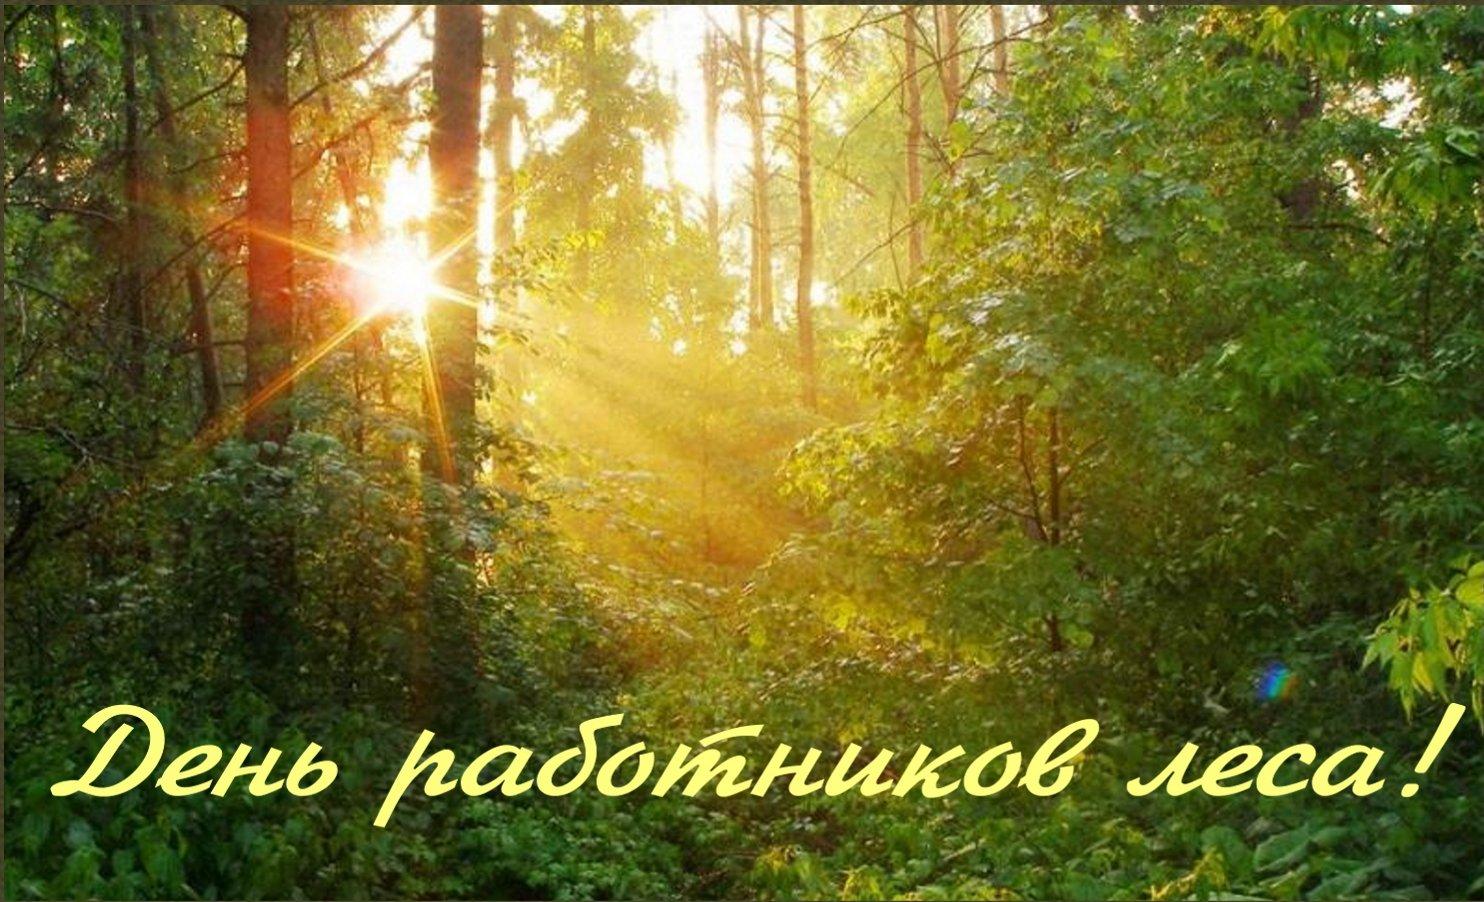 Открытки работника леса